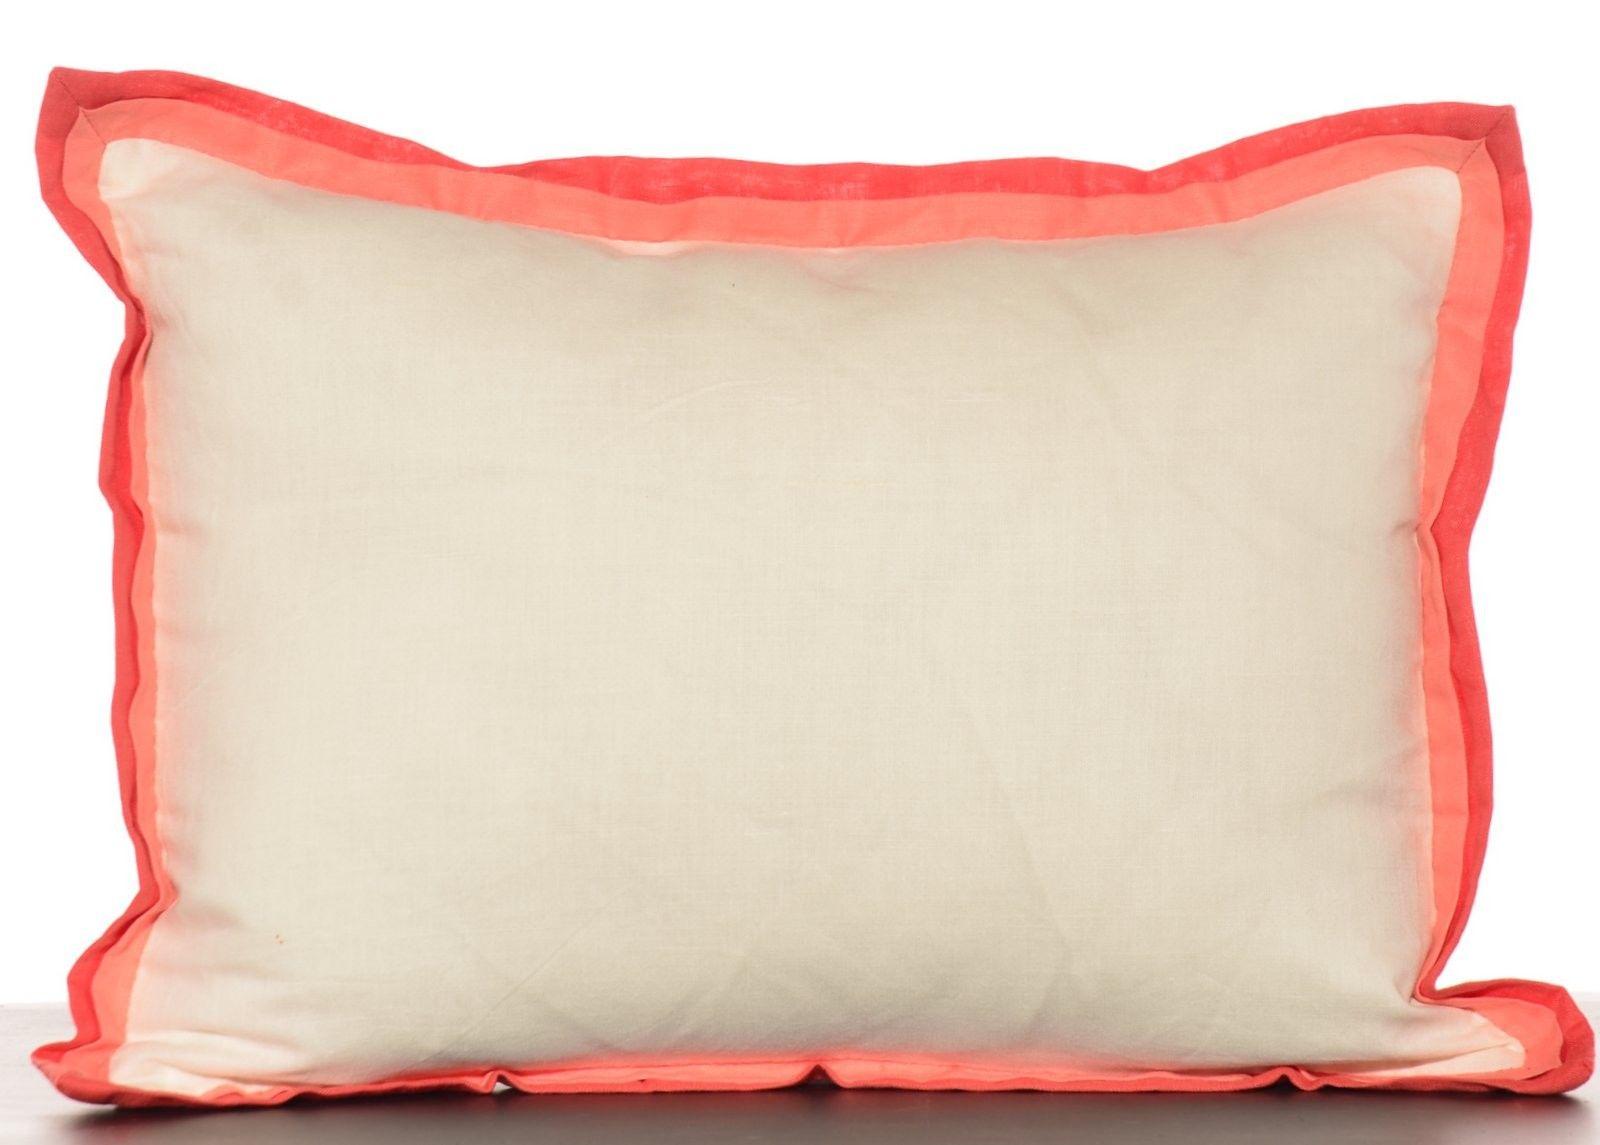 Tommy Bahama Palma Sola Breakfast Pillow   Wayfair   Coral/Apricot ...